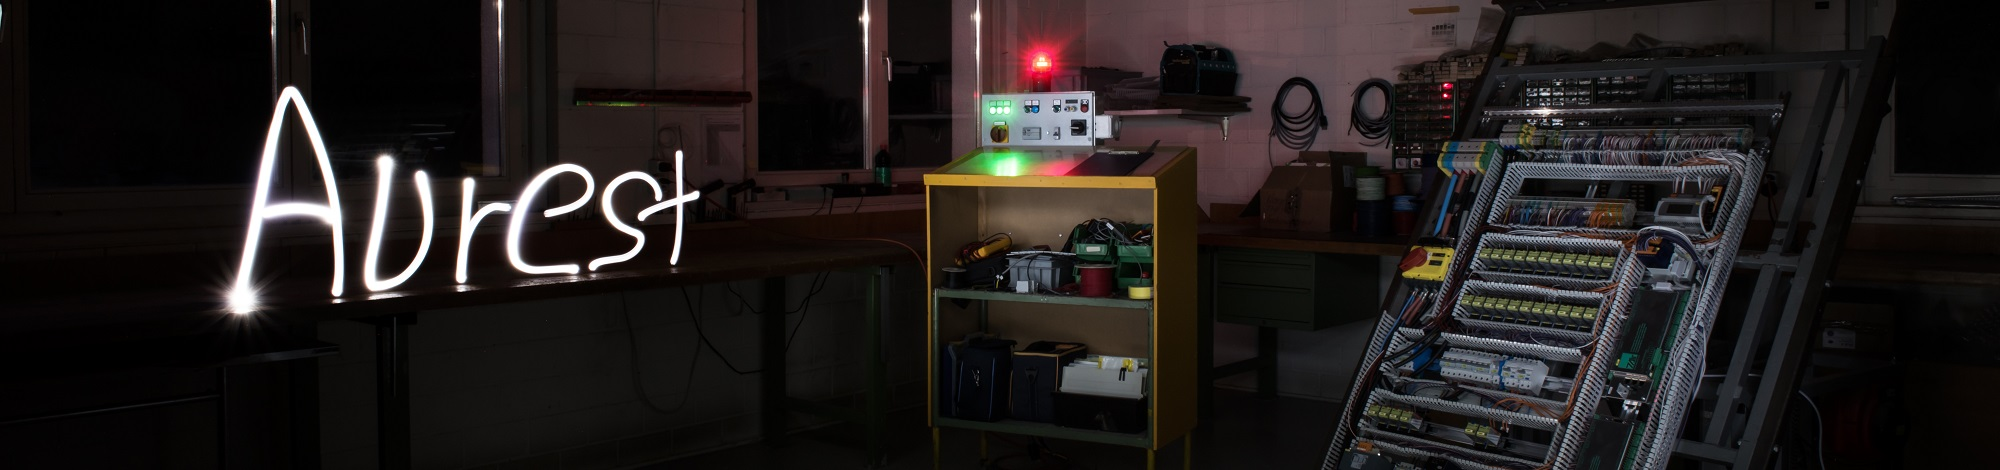 Lightpainting in Werkstatt aurest